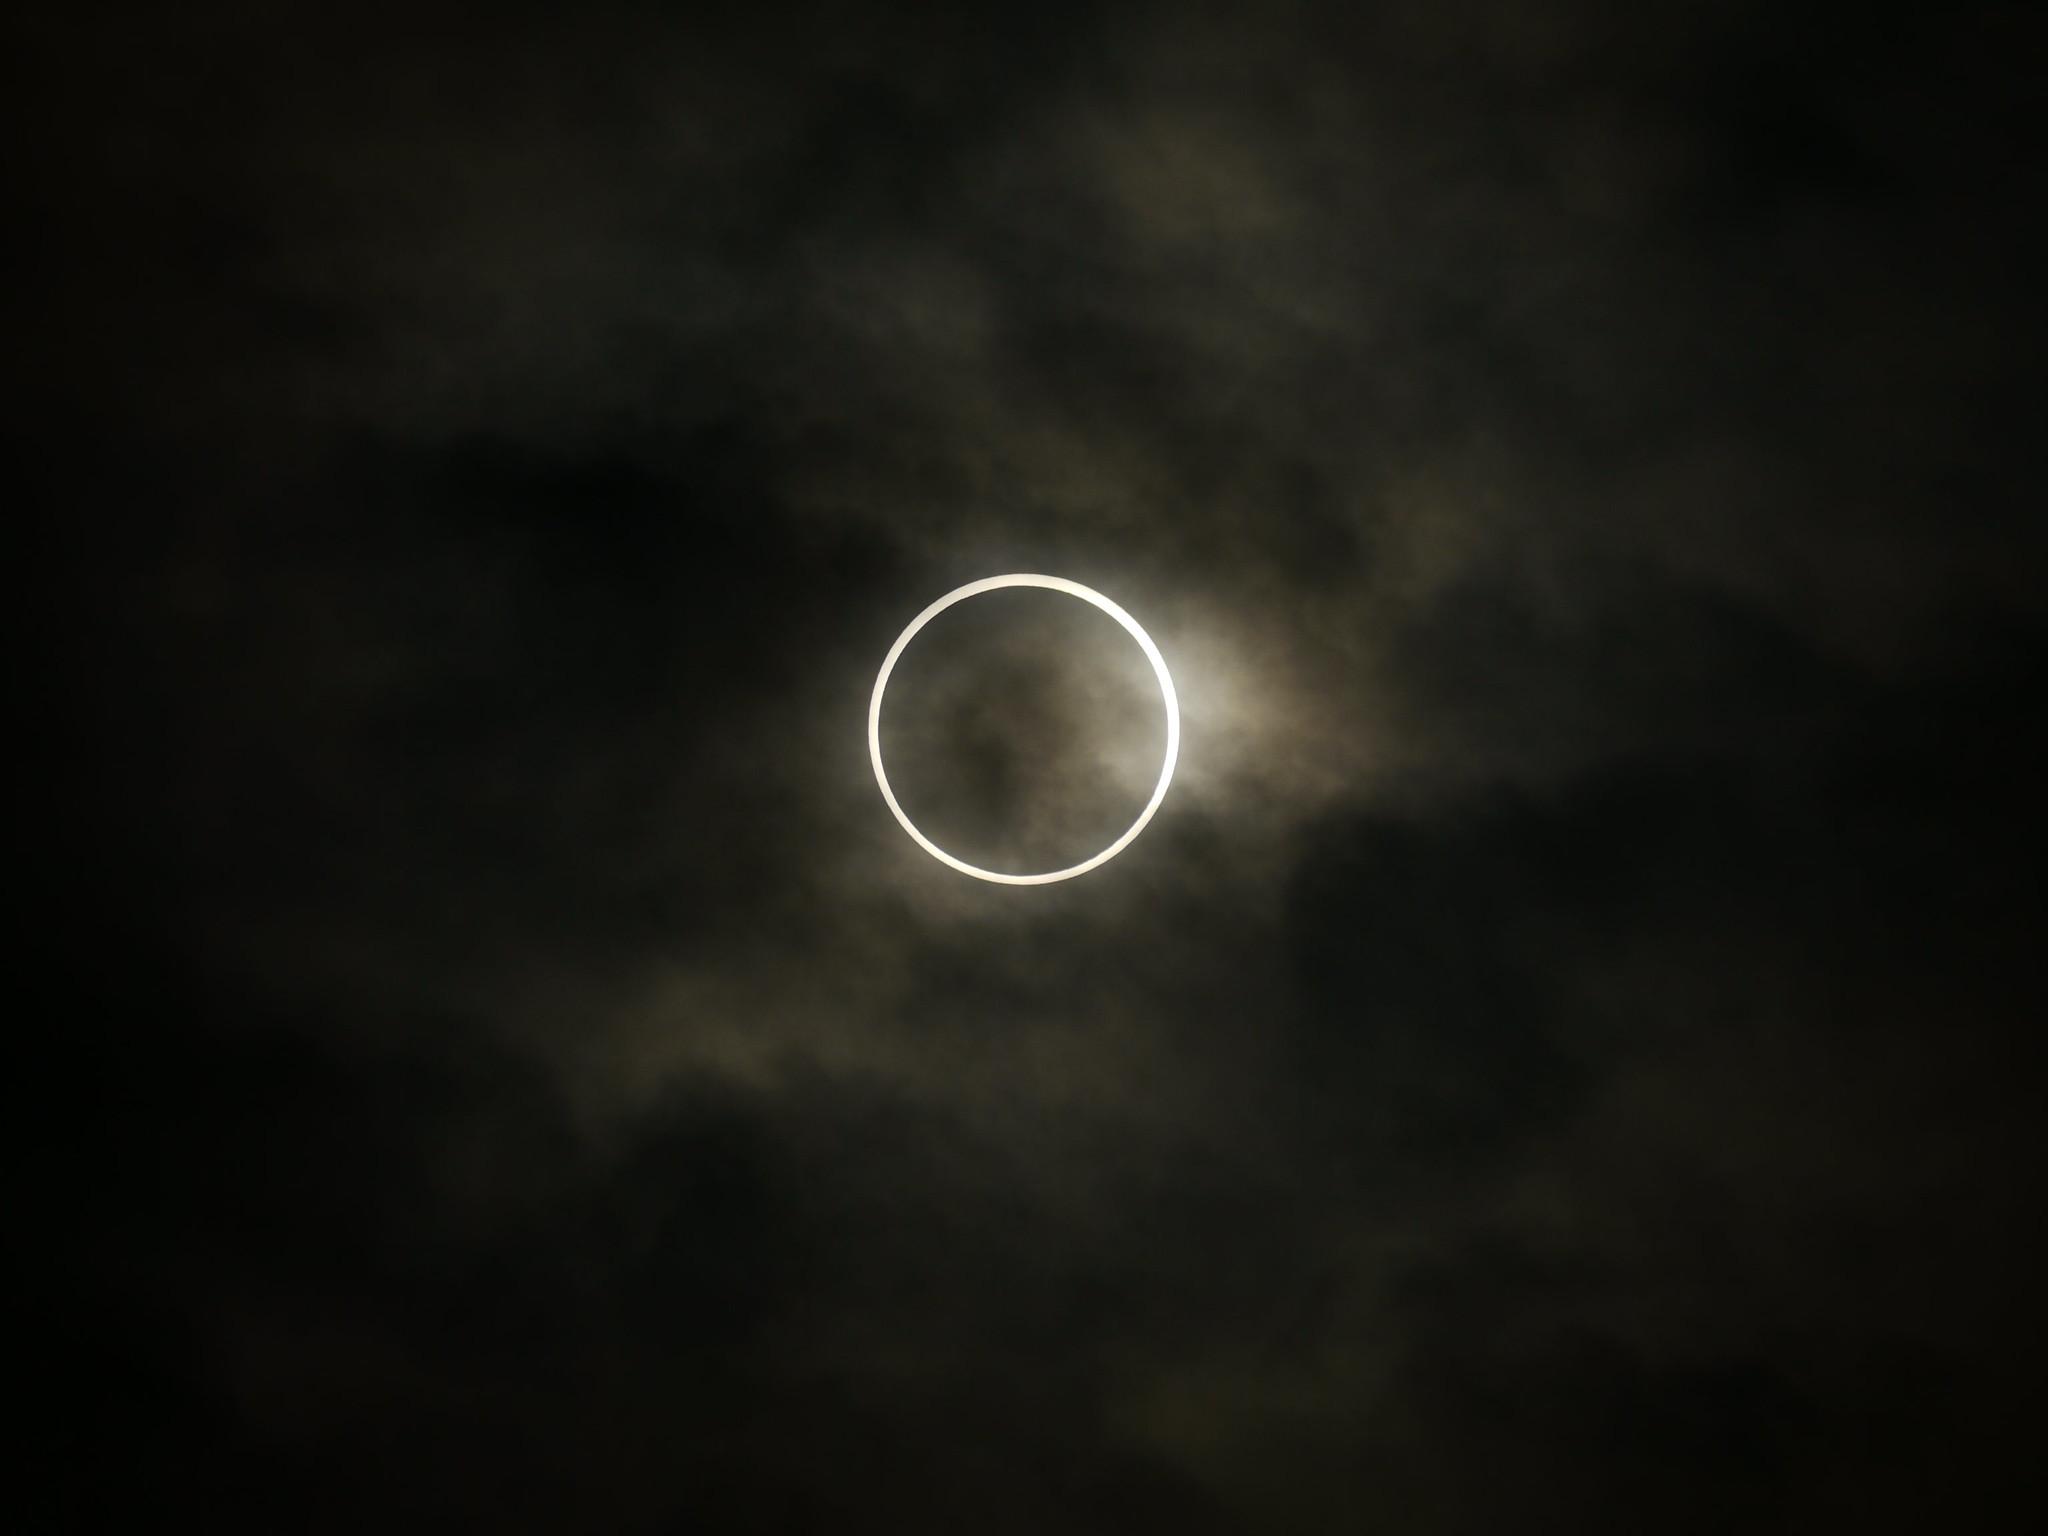 Annular Eclipse – Japan – May 21, 2012 CREDIT: Hidetsugu Tonomura